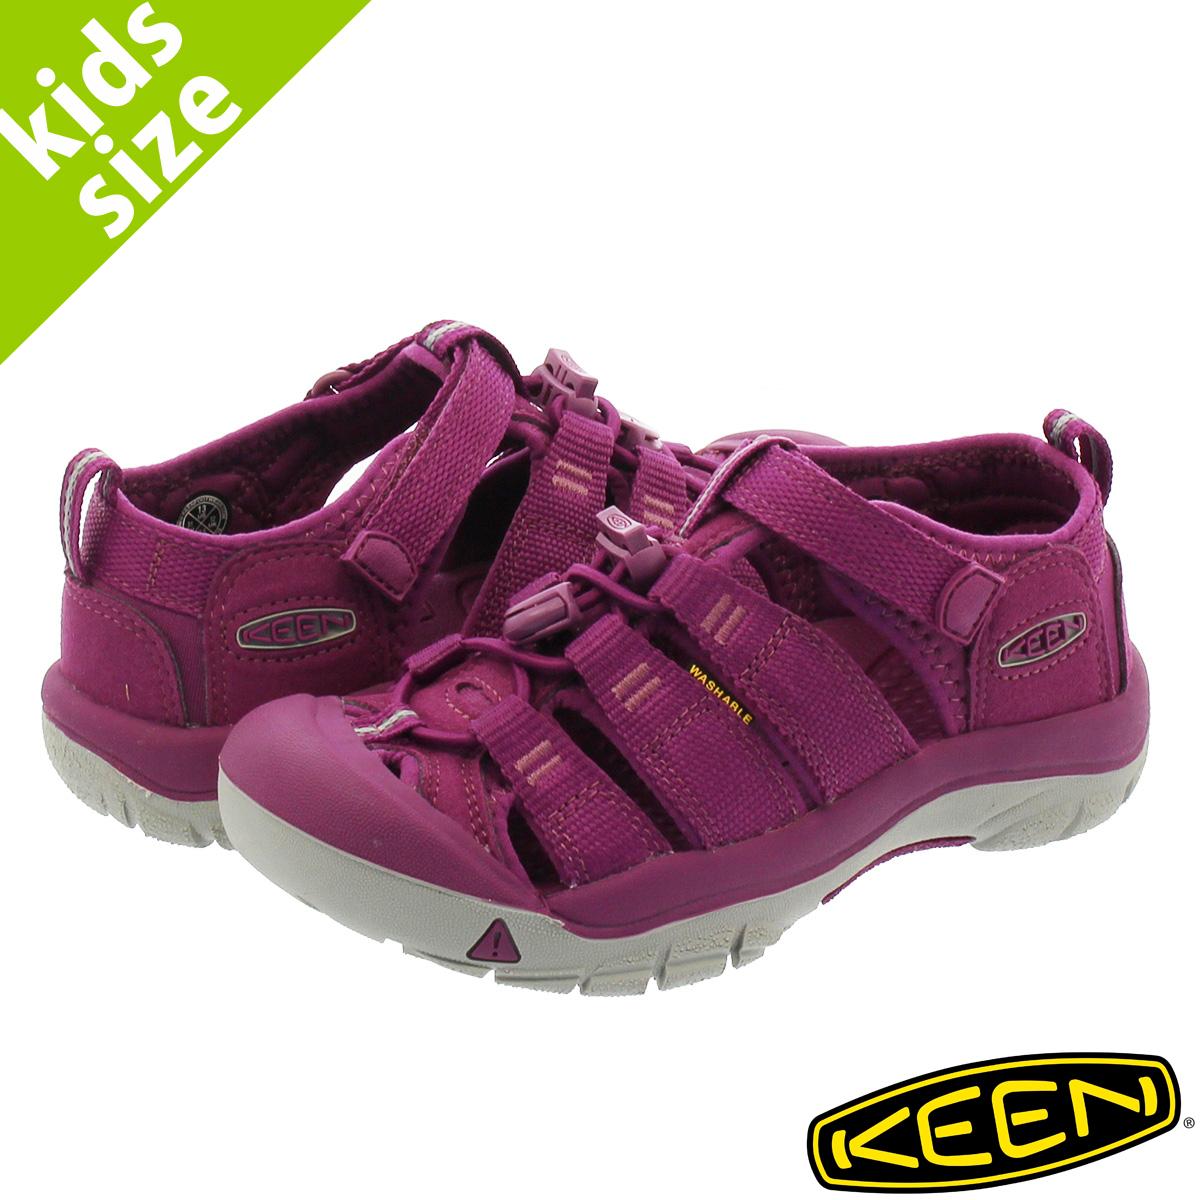 42c3d95f9c06 LOWTEX BIG-SMALL SHOP  KEEN KIDS NEWPORT H2 Kean kids Newport GRAPE ...